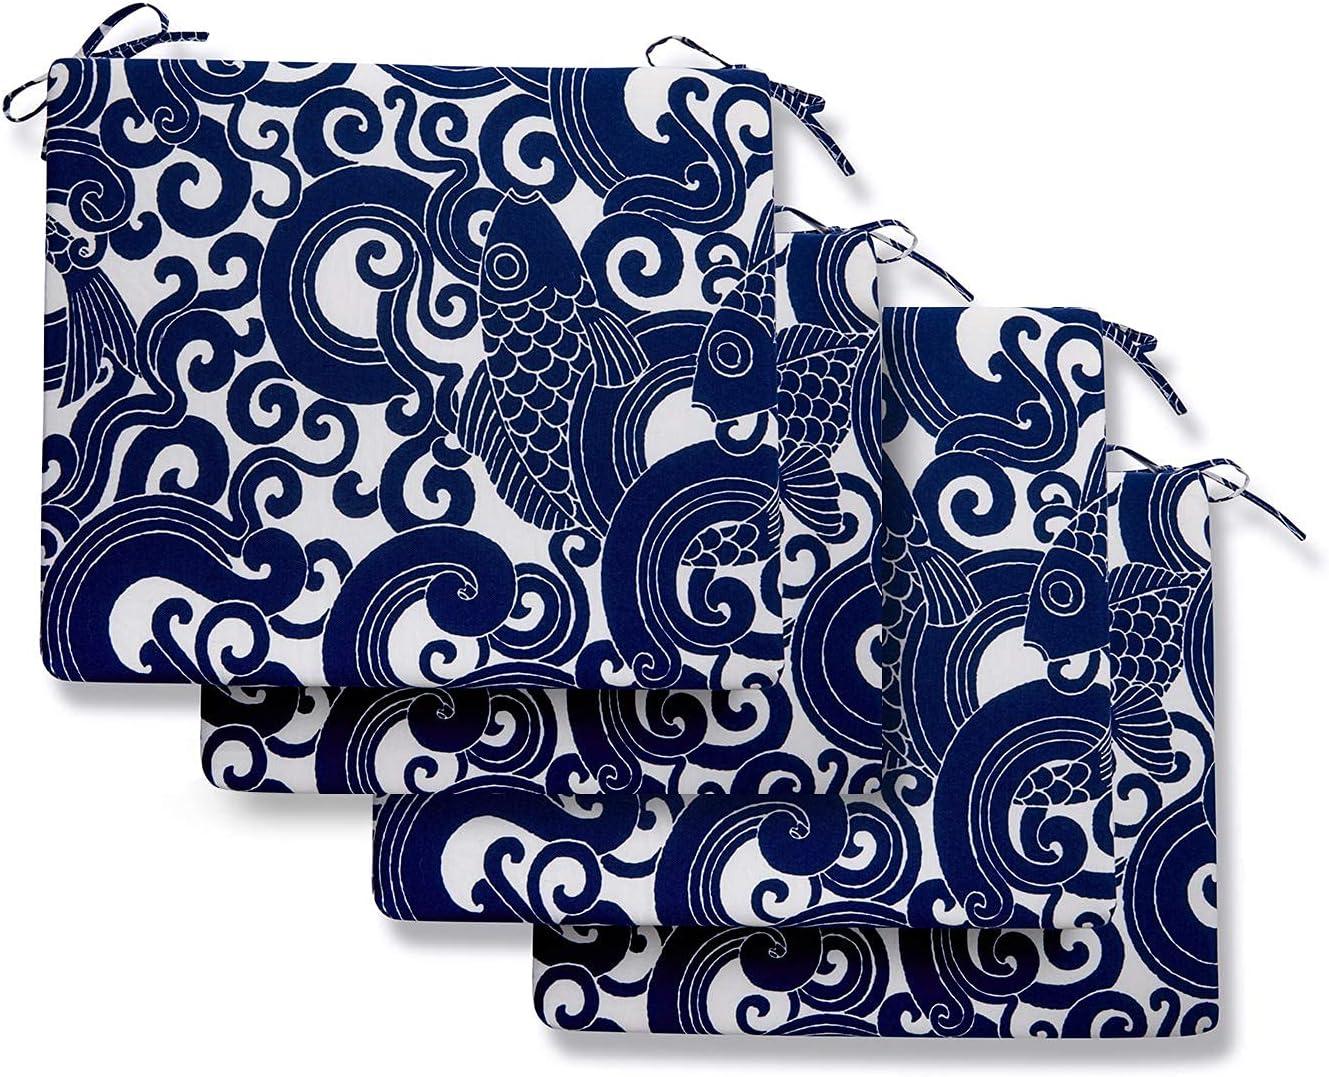 LOVTEX Patio Indoor Outdoor Challenge the lowest price of Japan Cushions C Water-Resistant Dedication Furniture